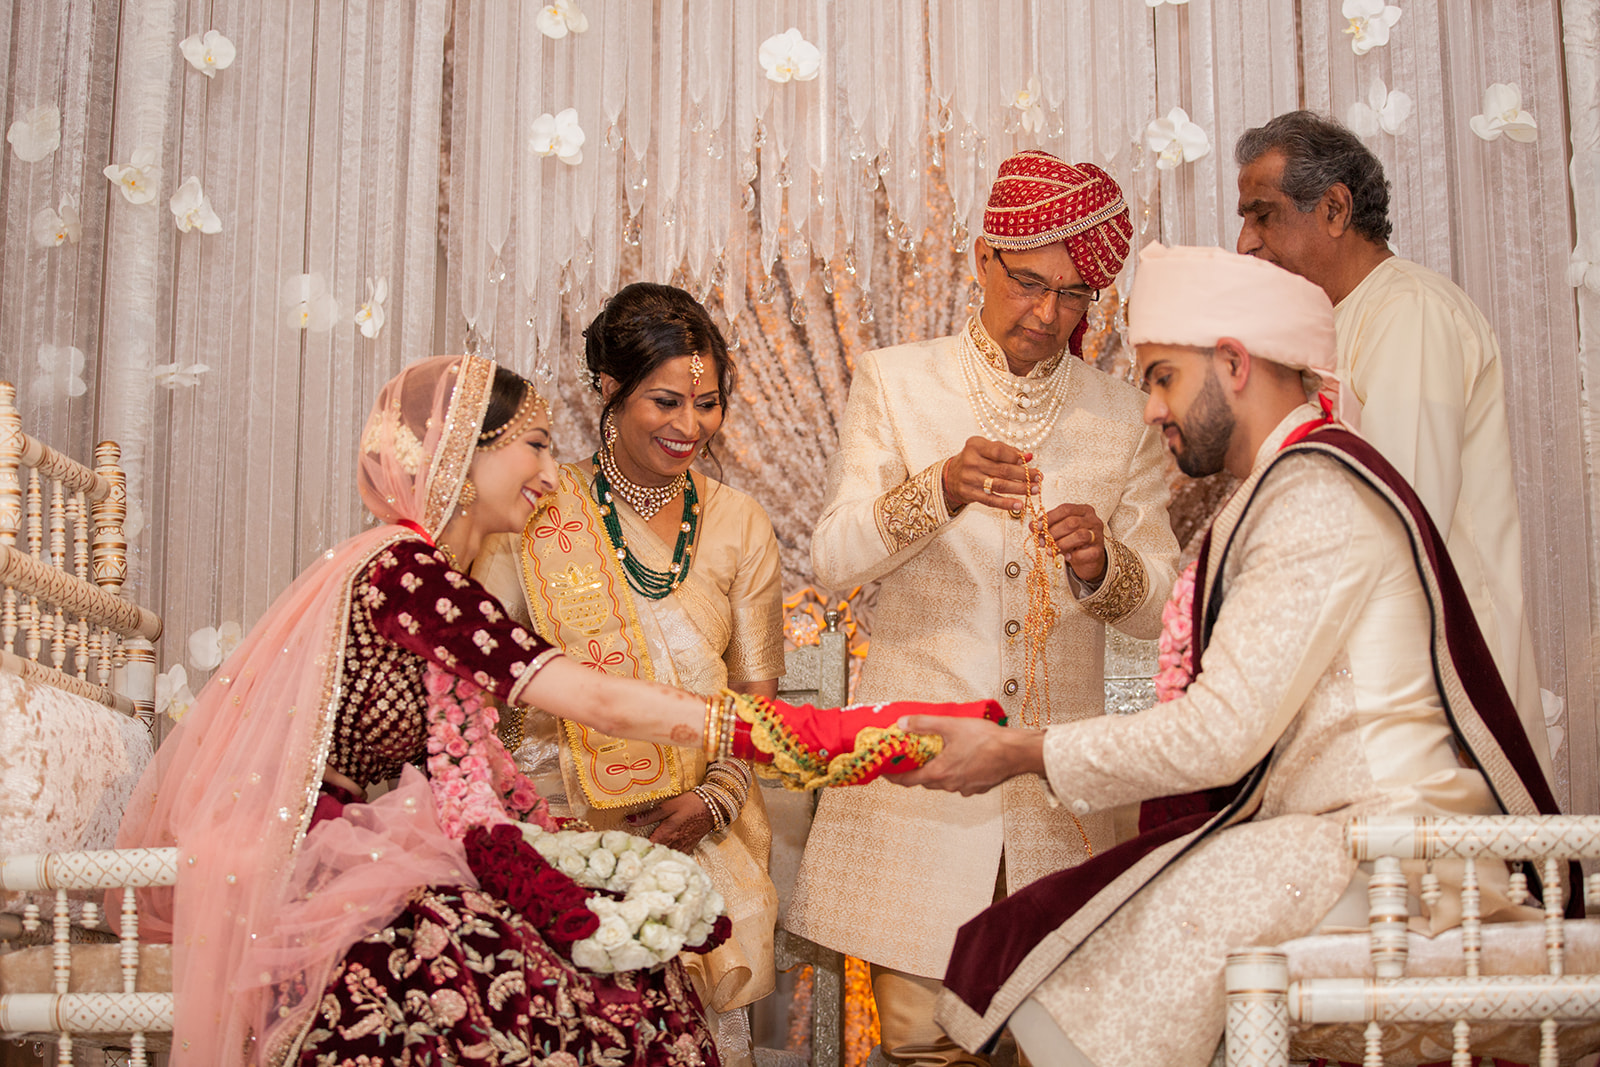 Le Cape Weddings - Puja and Kheelan - Ceremony -39.jpg